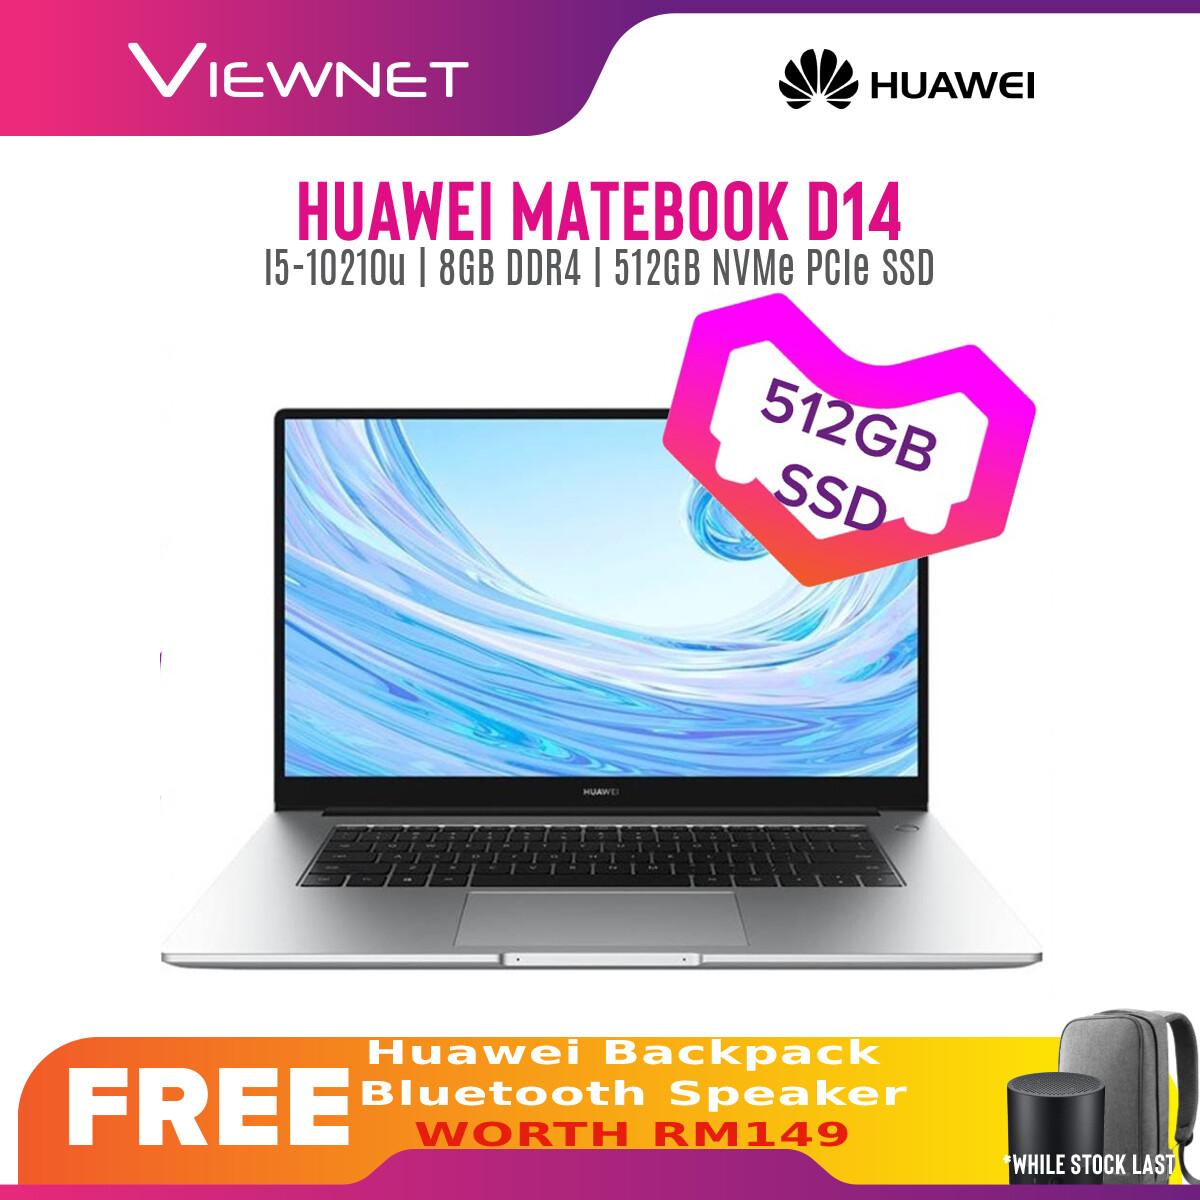 HUAWEI MATEBOOK D14 i5-10219U LAPTOP 8GB DDR4 512GB PCIE SSD FHD SILVER